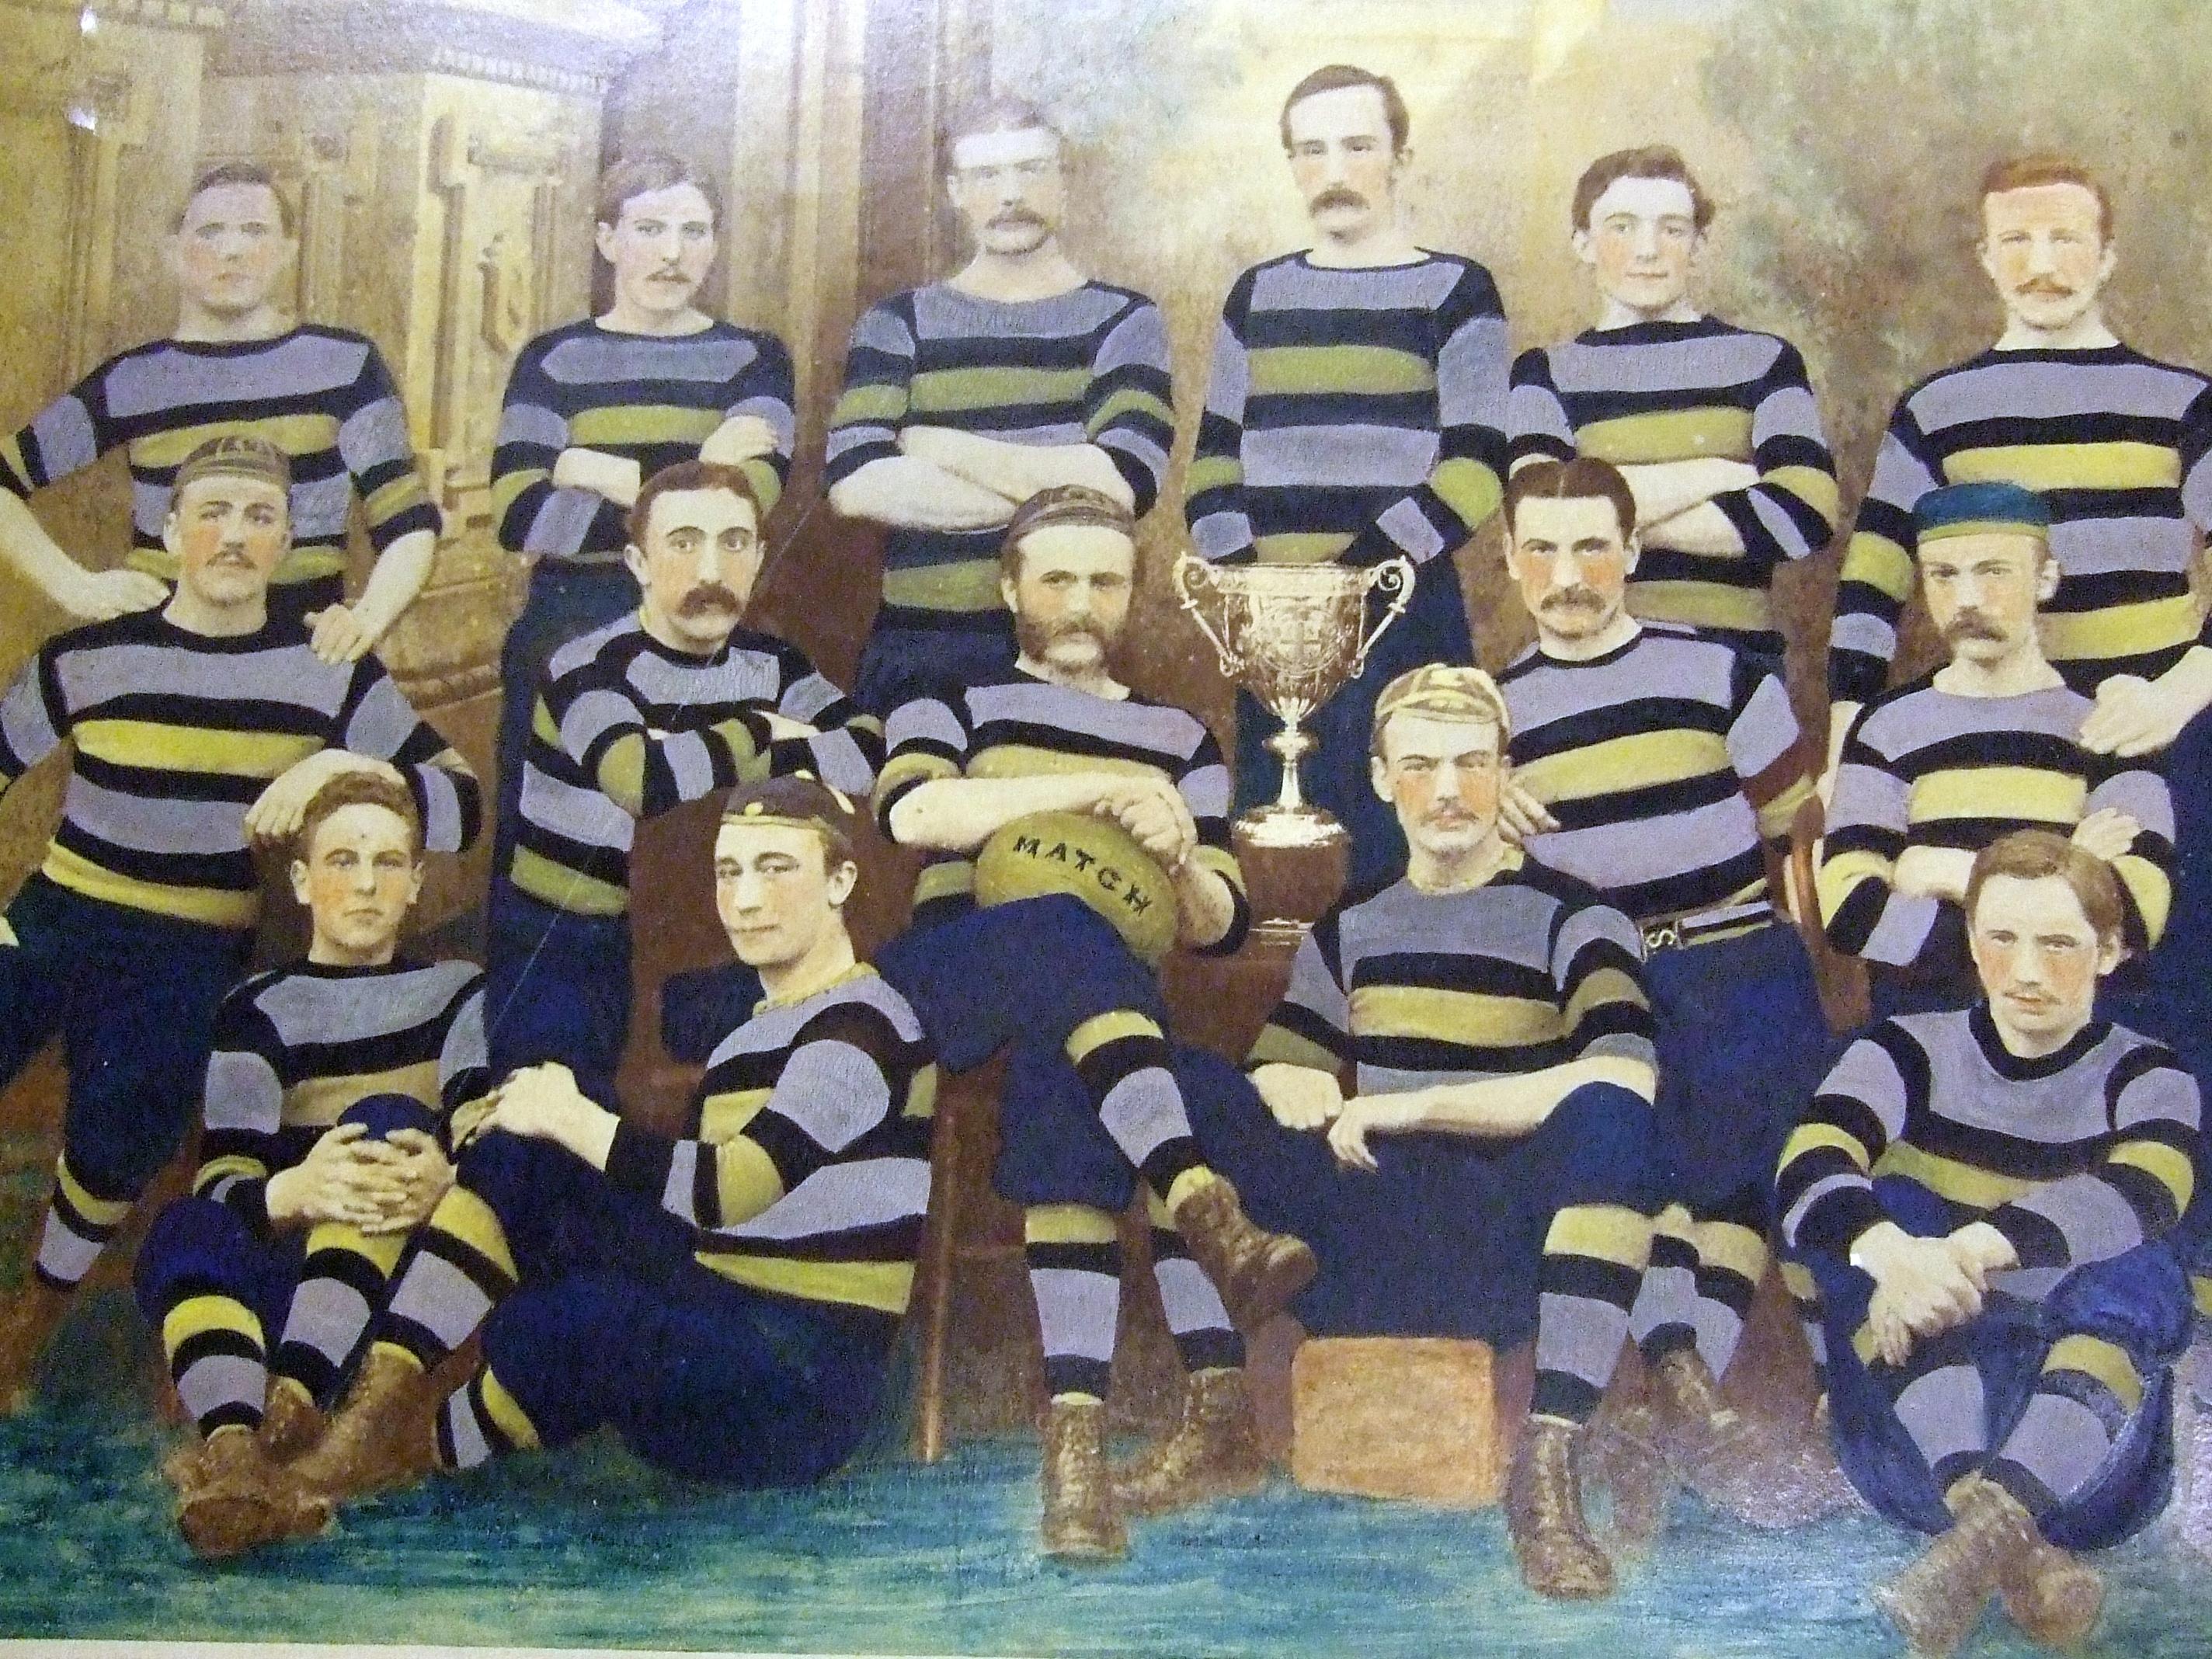 Sunderland Rugby Team, 1881